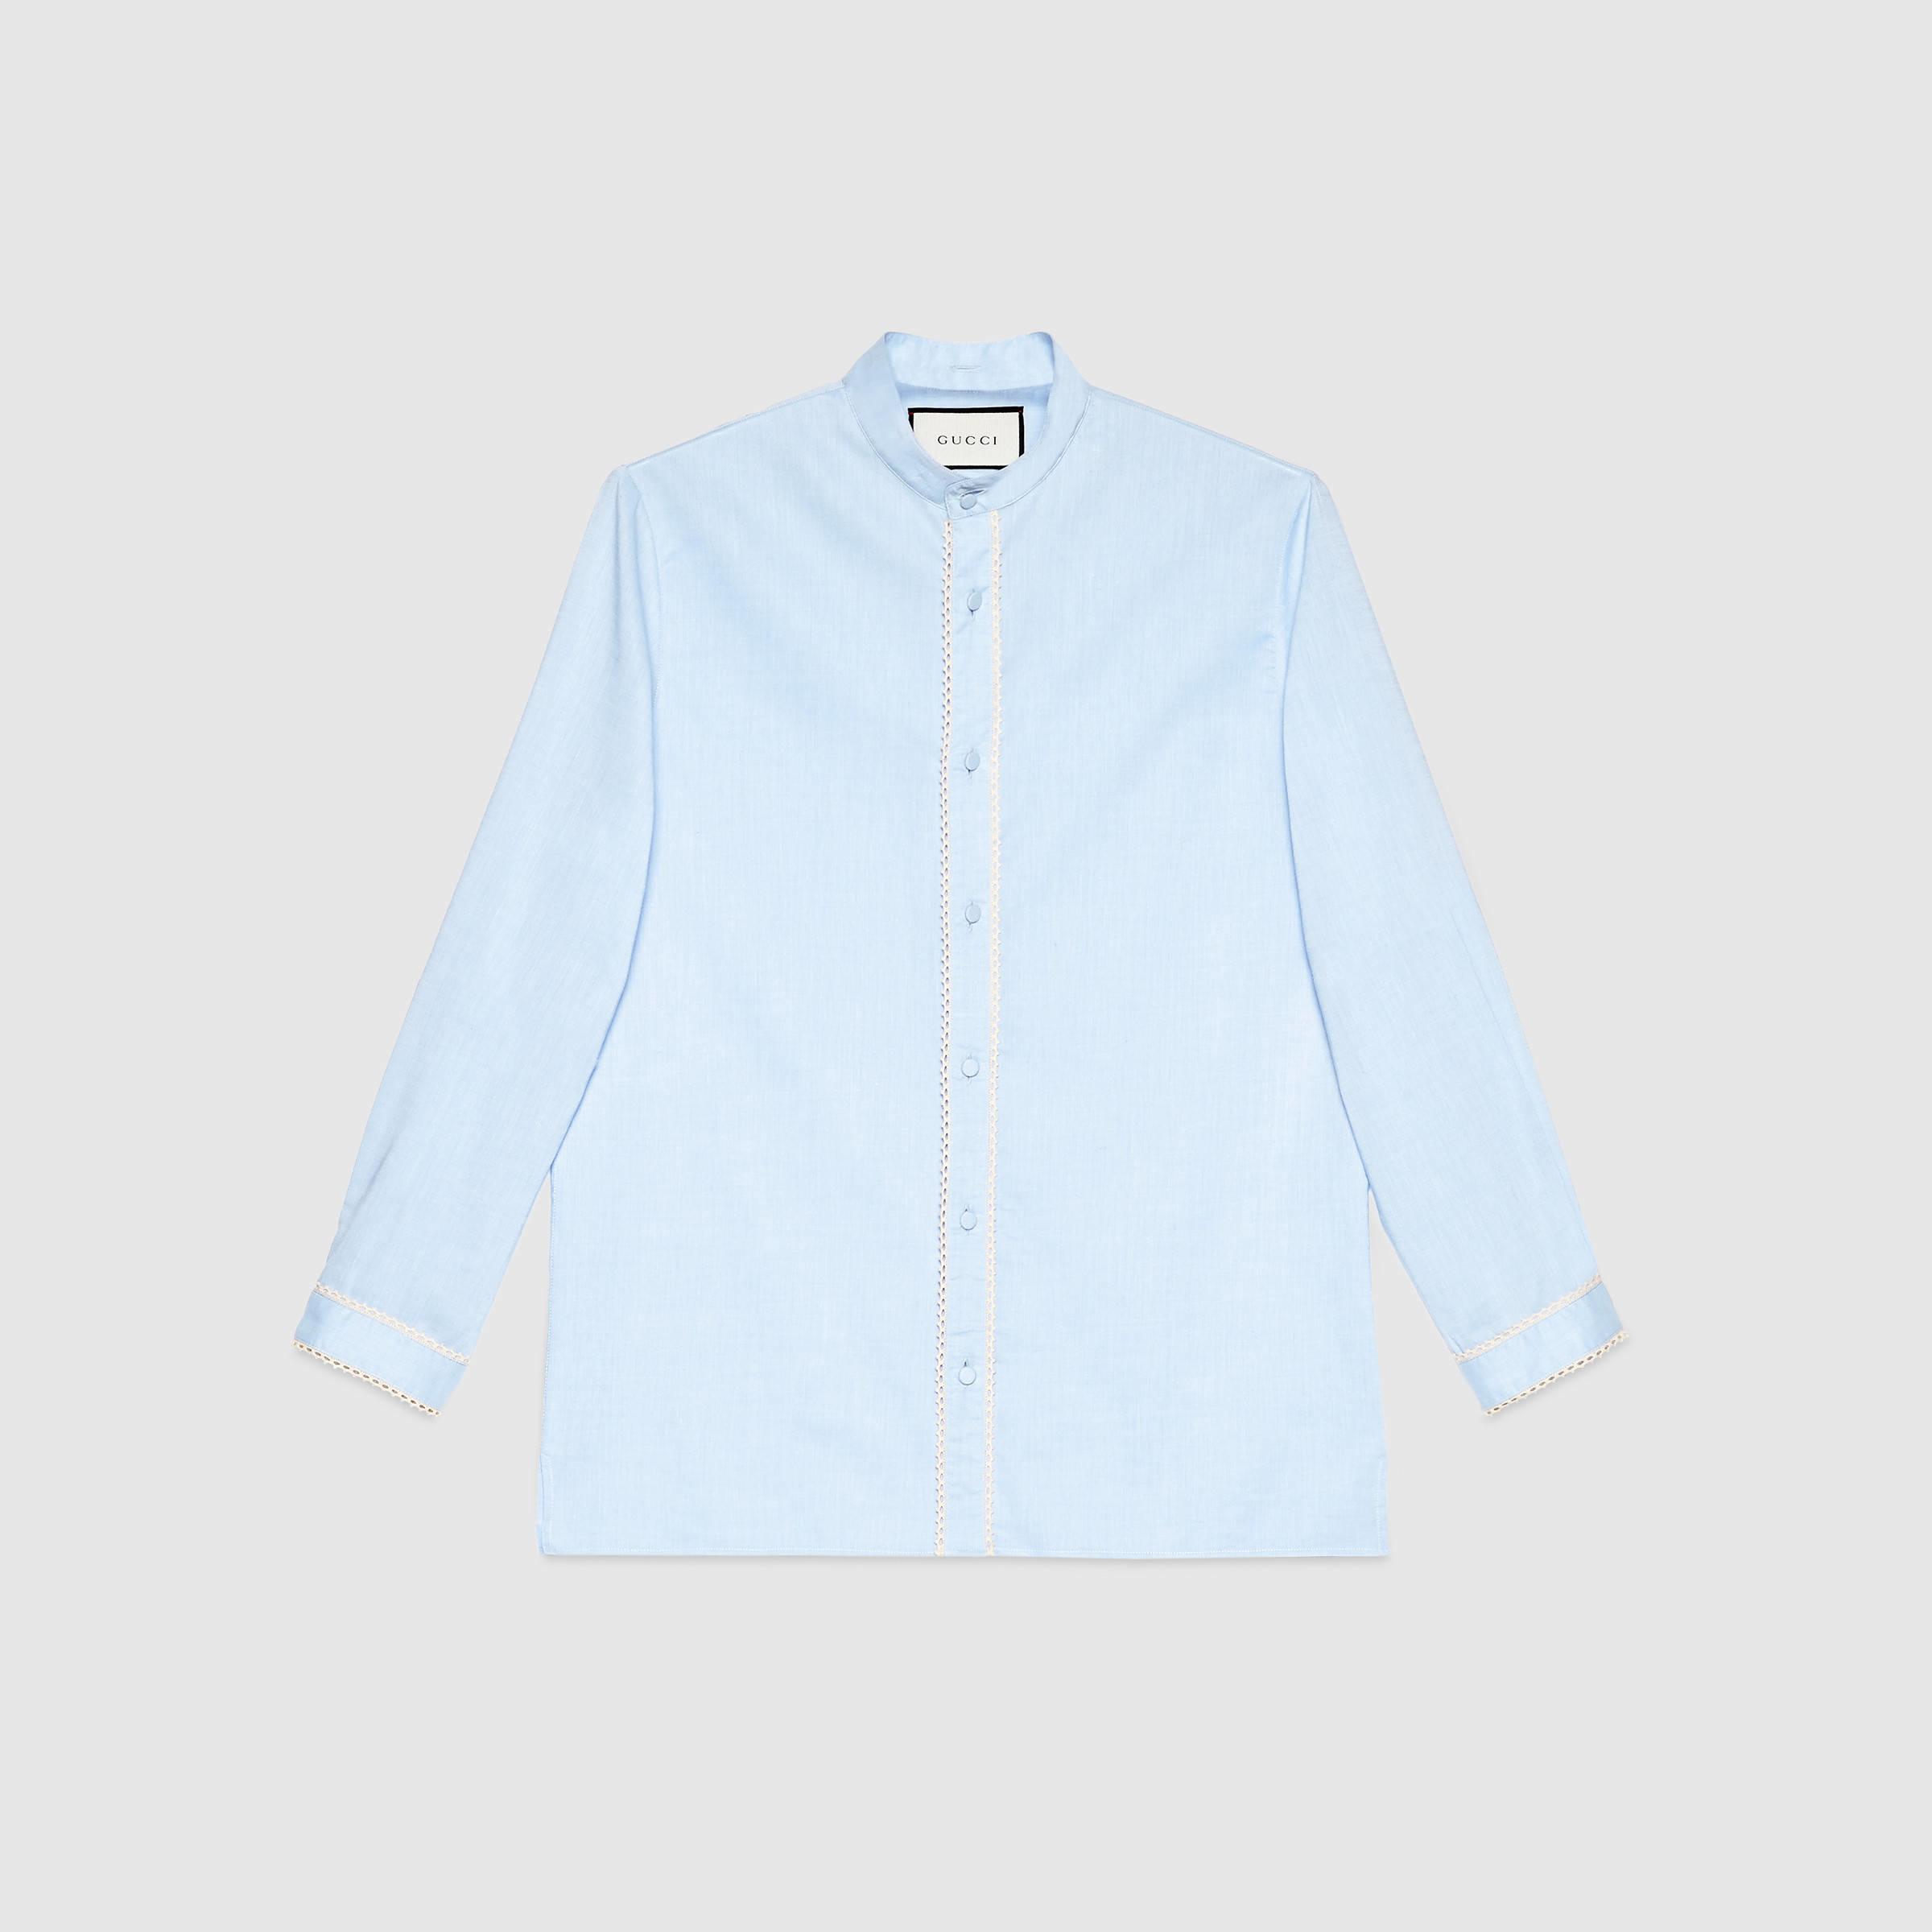 Lyst Gucci Detachable Collar Cambridge Shirt In Blue For Men